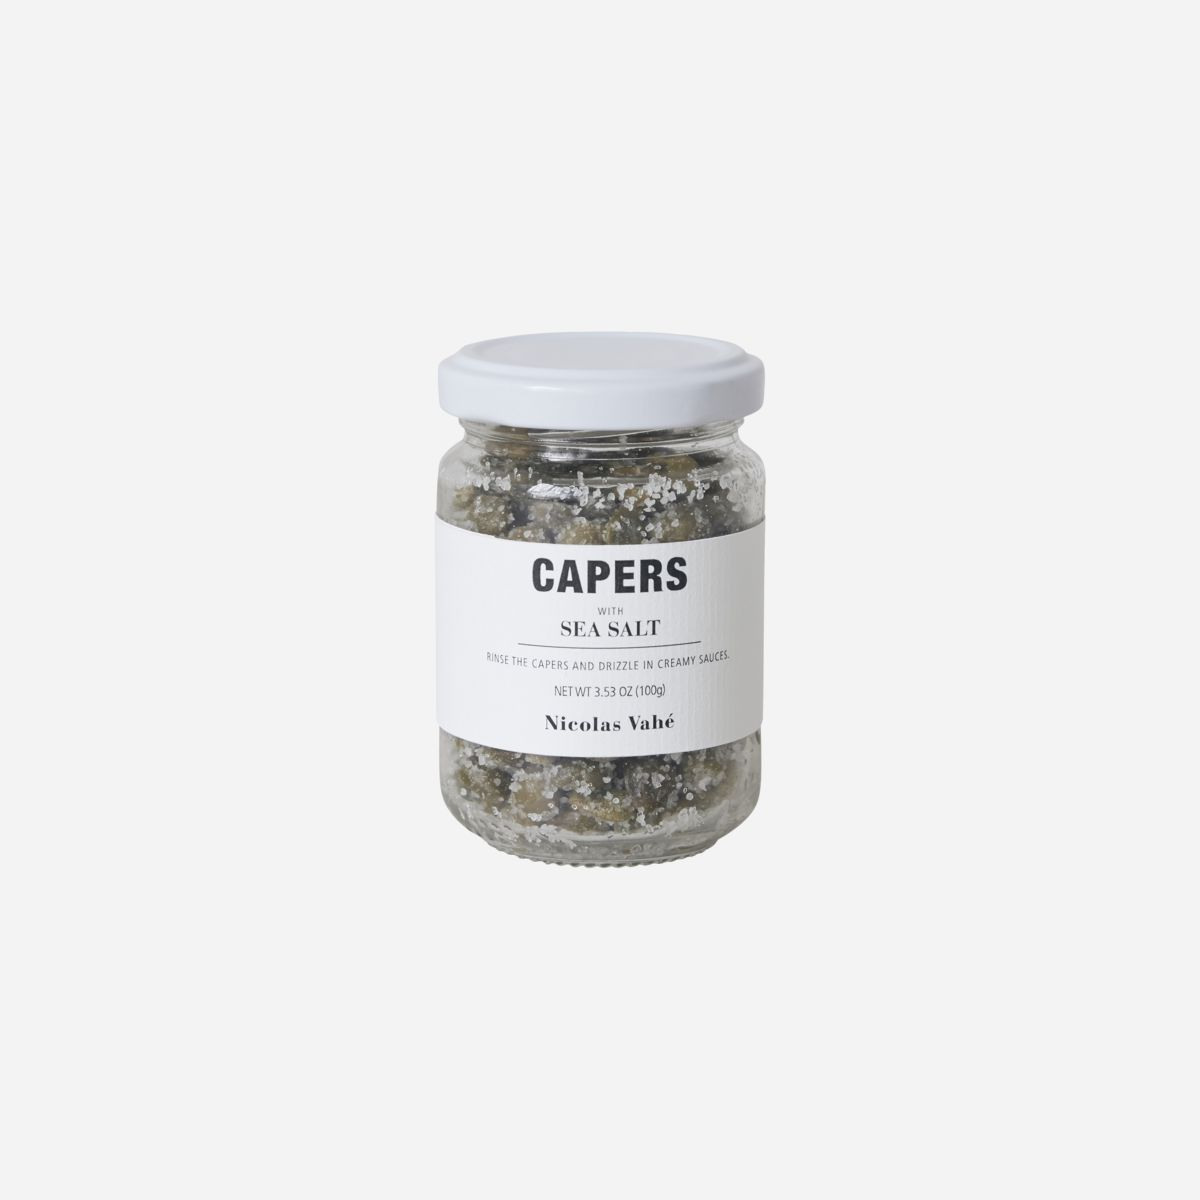 Capers Sea Salt